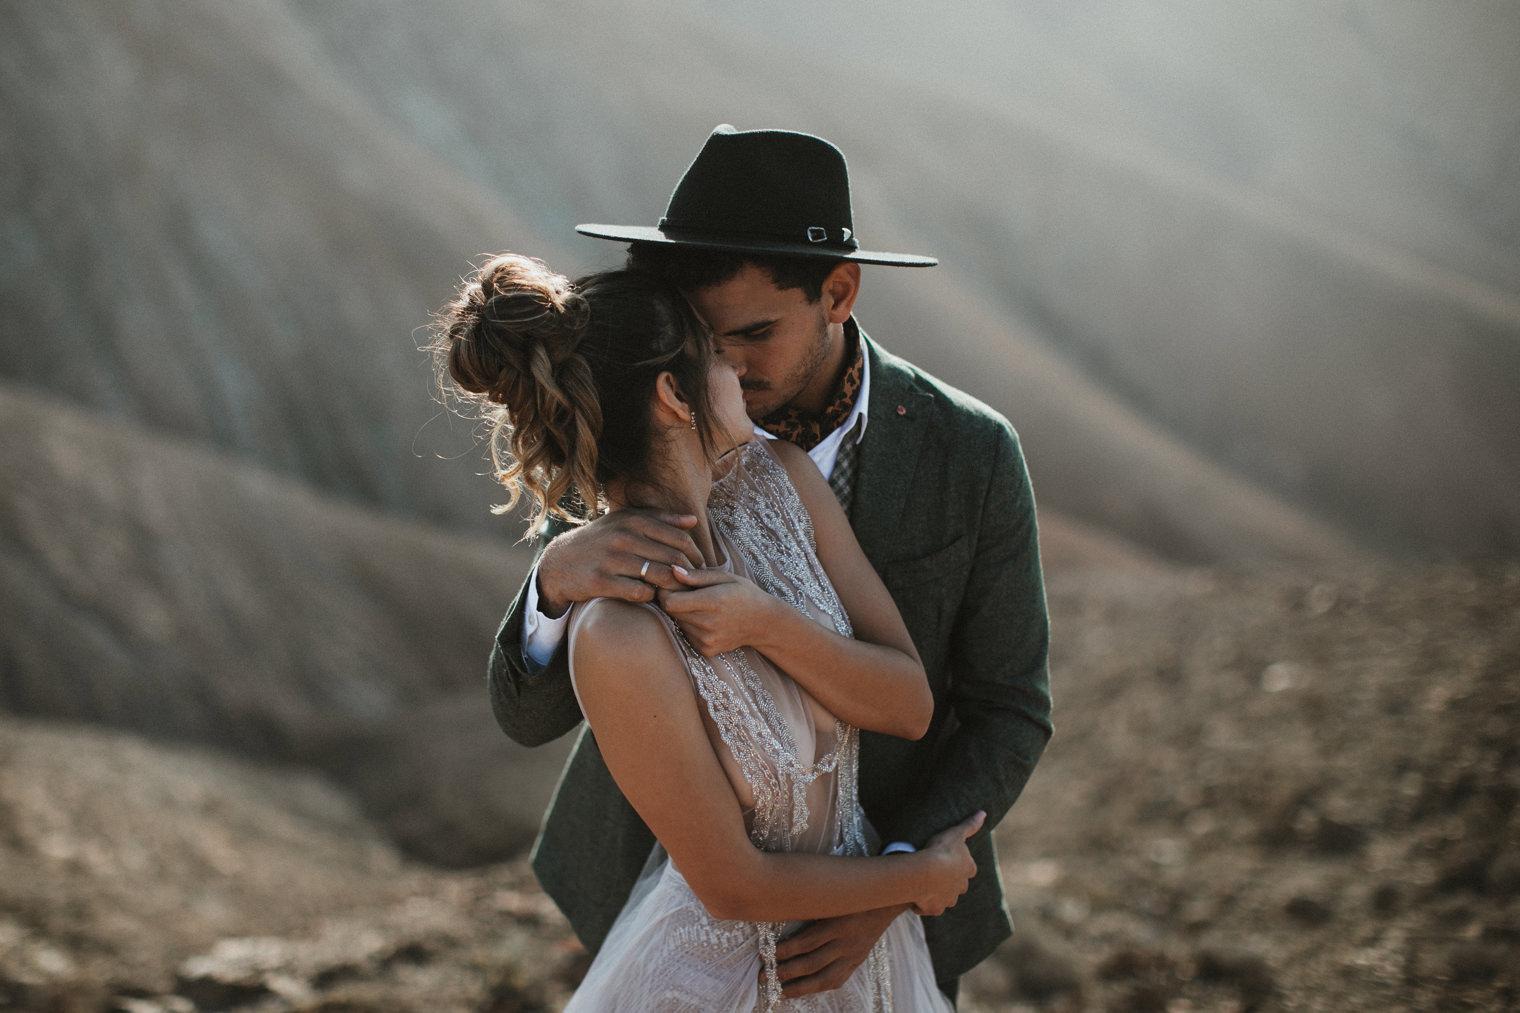 Bride and Groom holding each other in Fuerteventura during a Fuerteventura elopement shoot